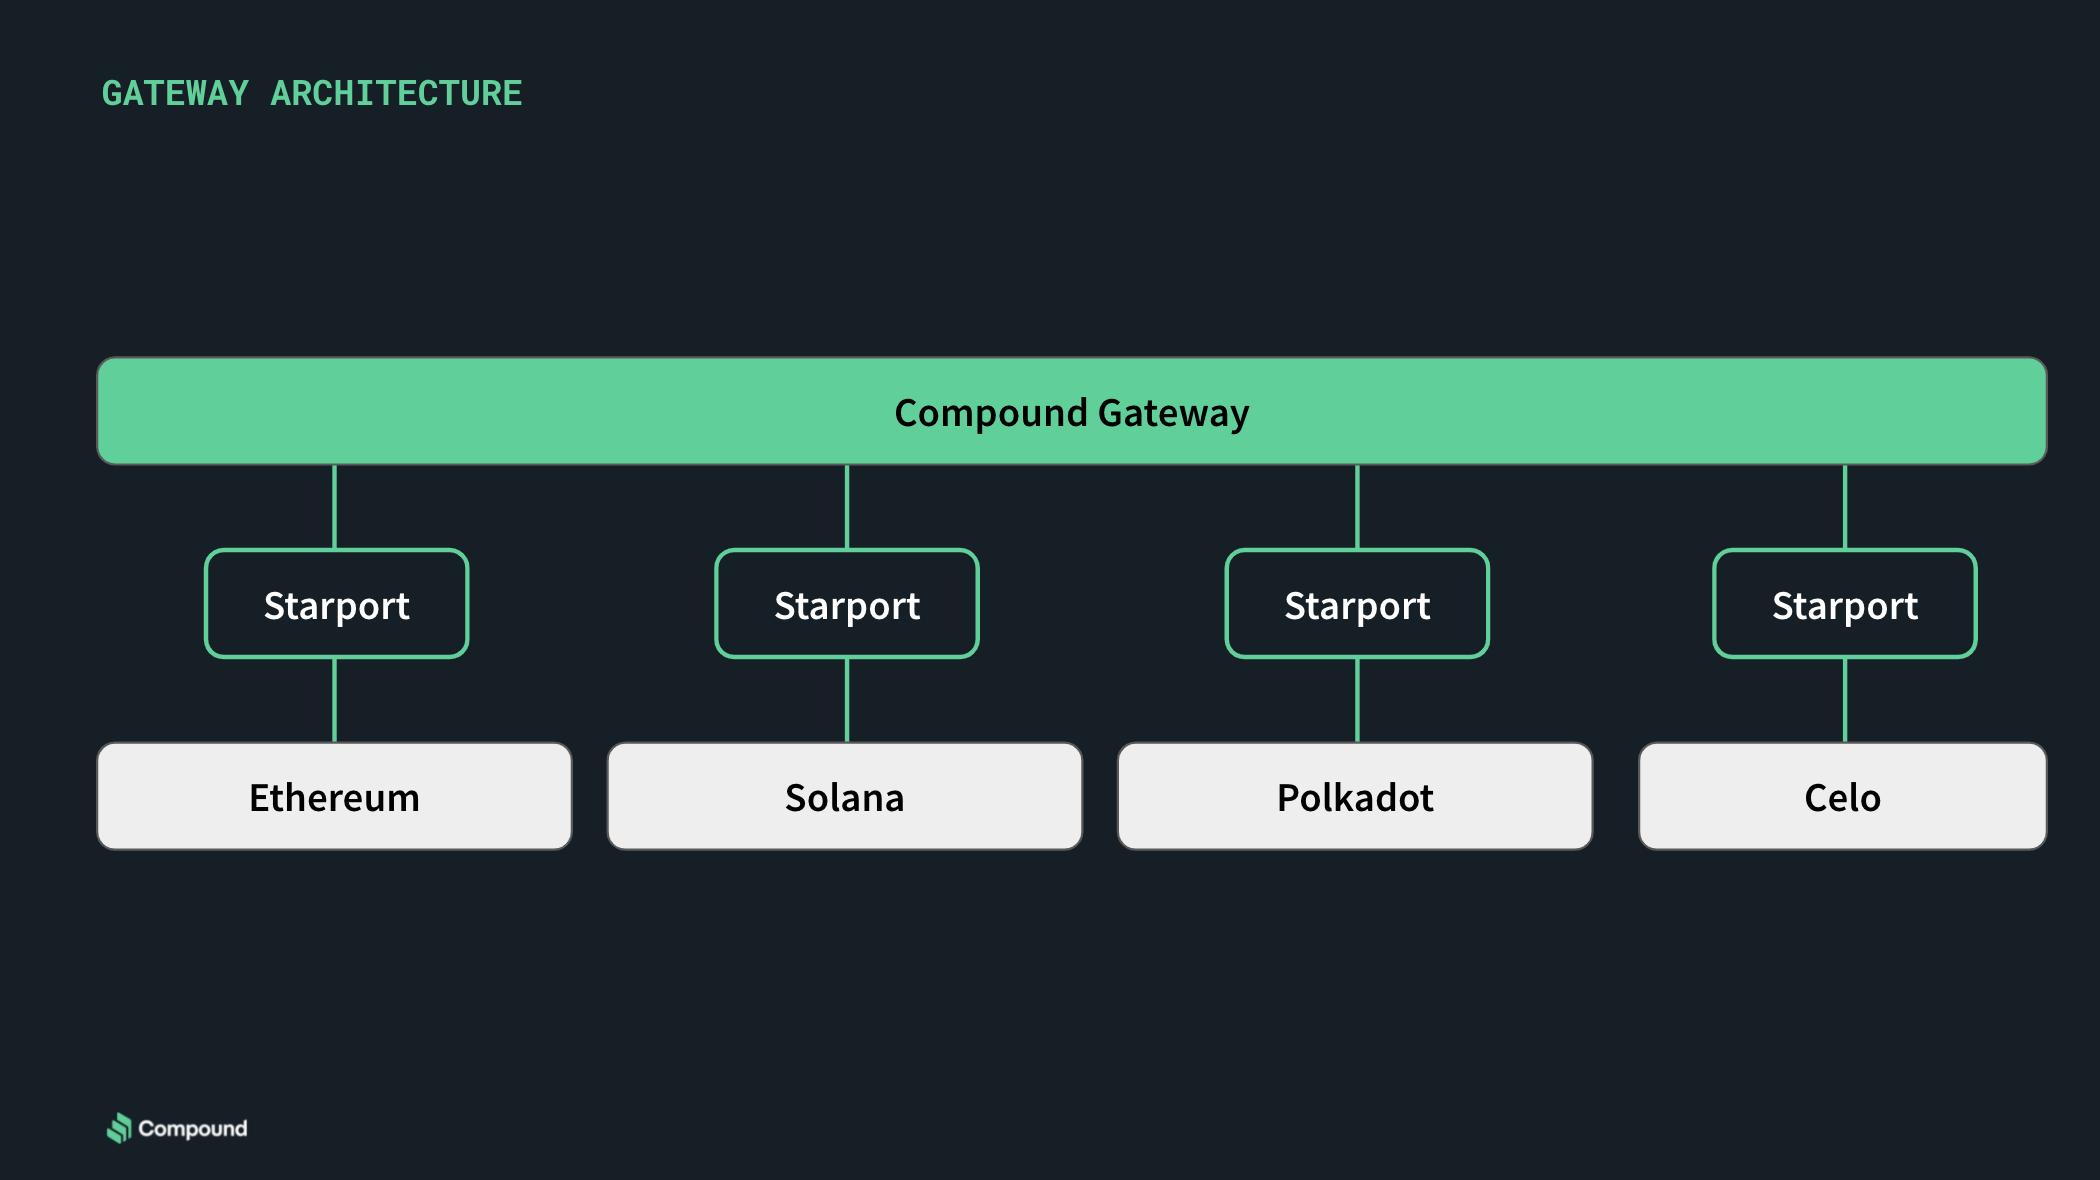 DeFi之道丨Compound研究分析:押注Gateway成为下一个爆炸点